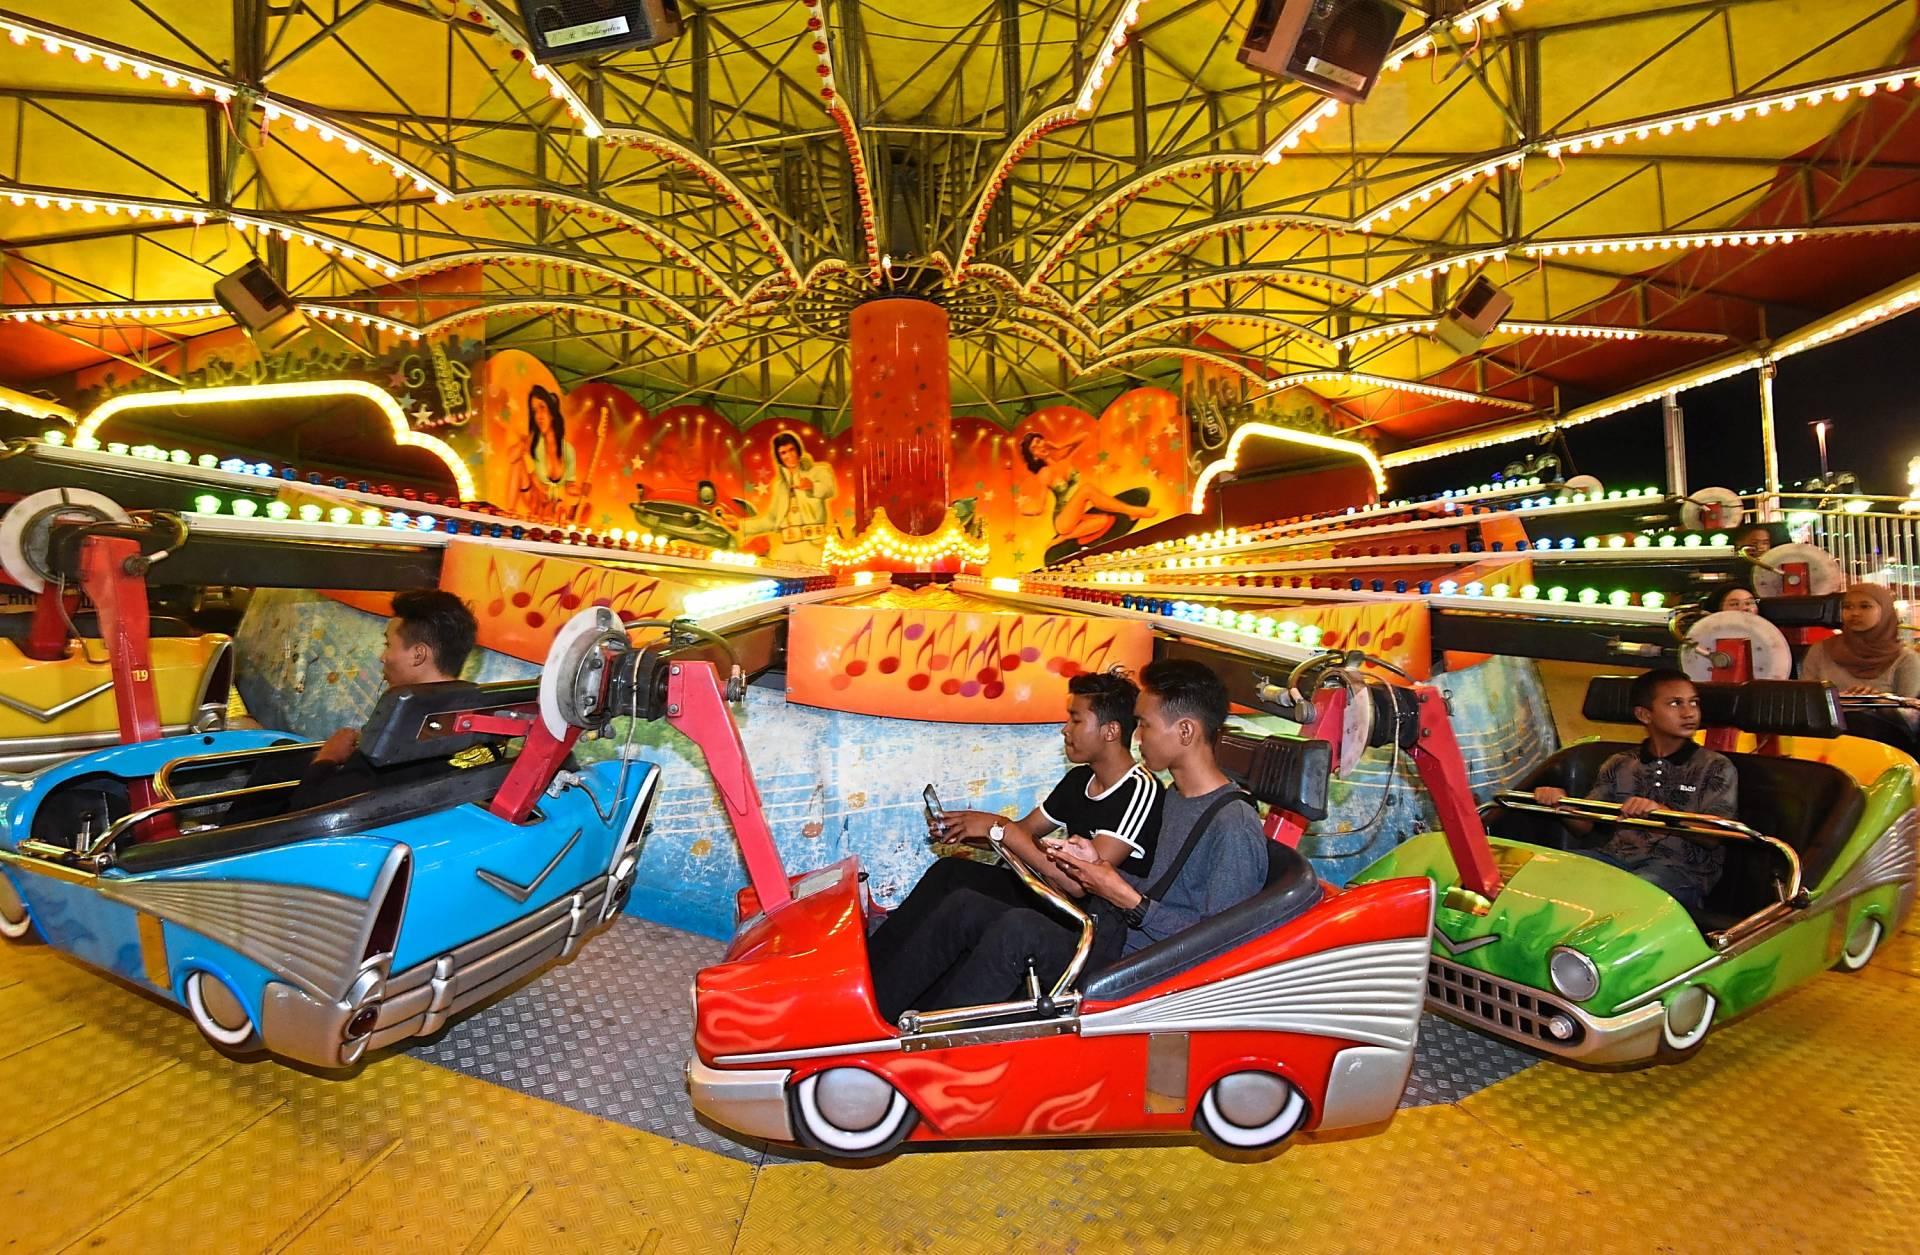 Five decades of fiesta fun